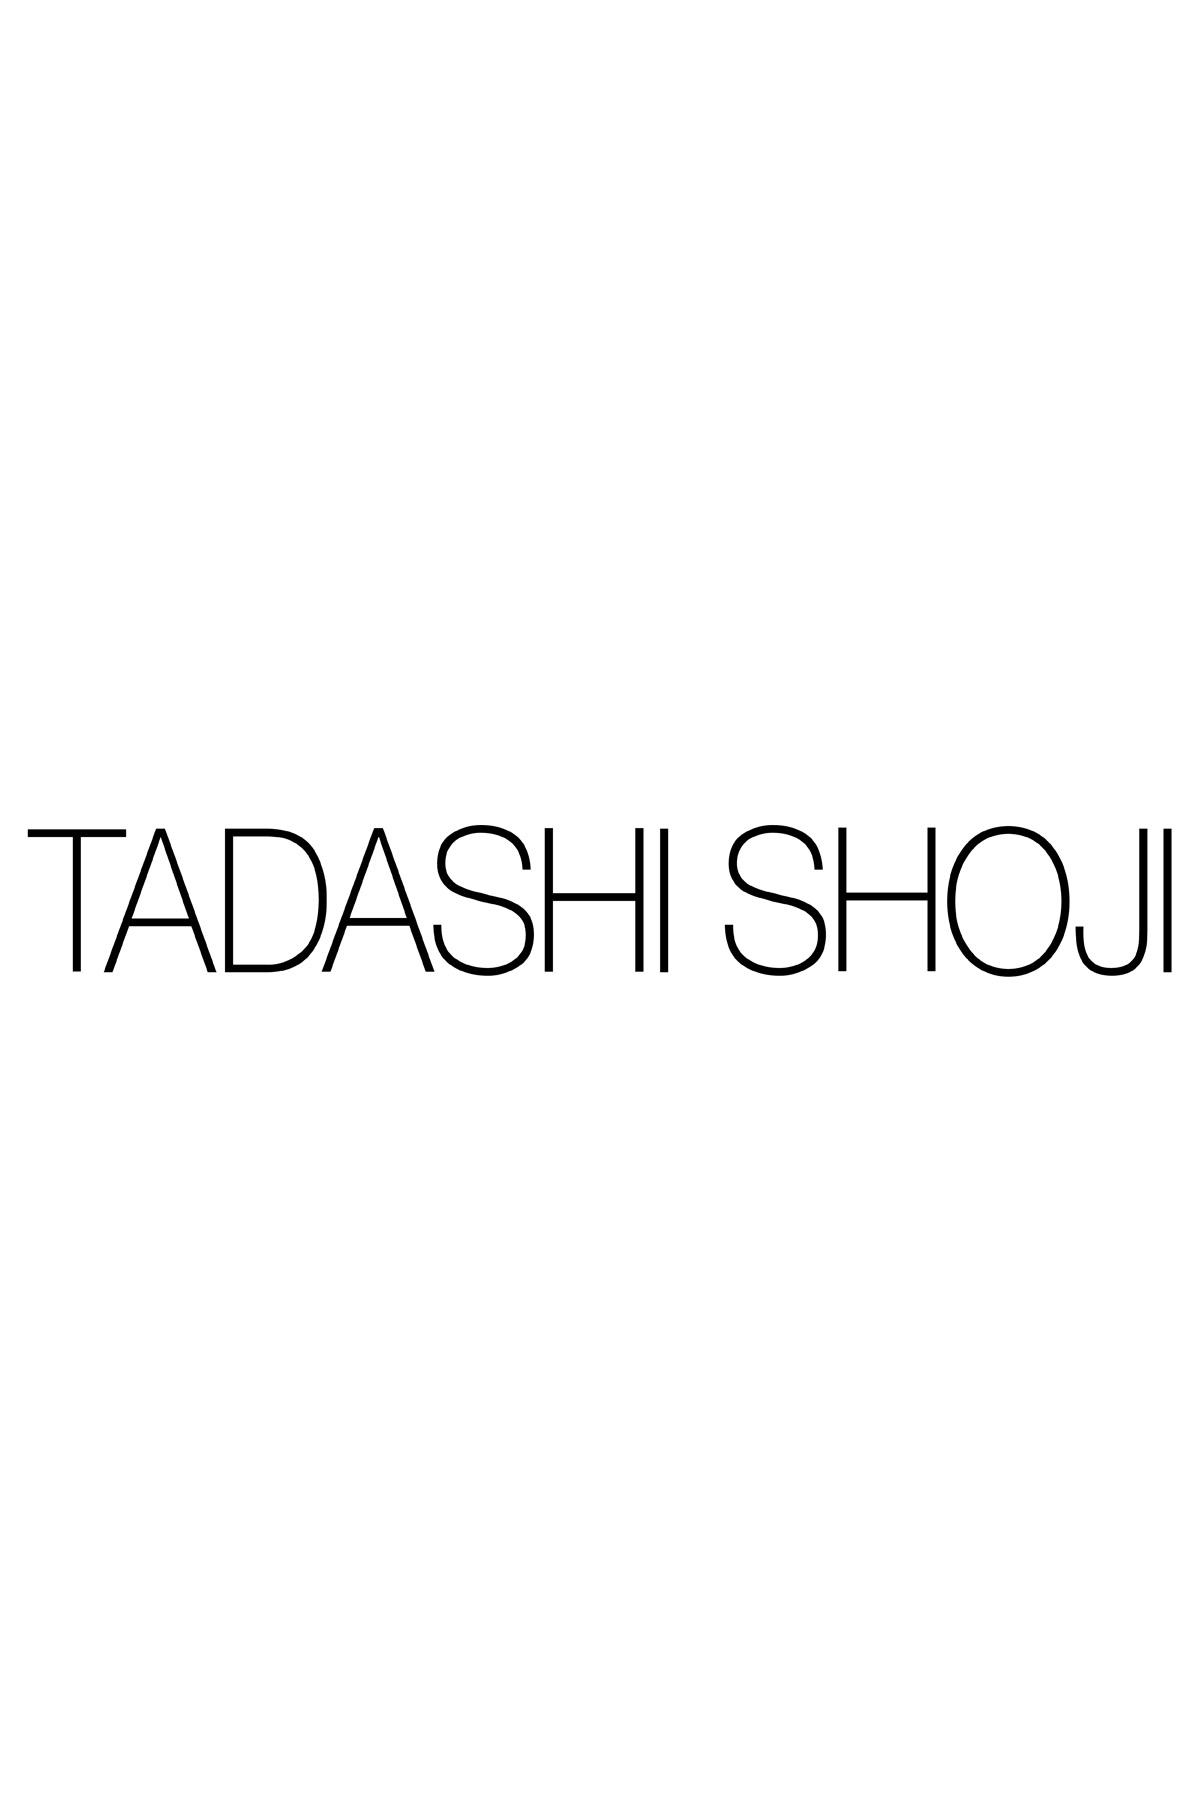 Tadashi Shoji - Haxton Floral Applique Cape Gown